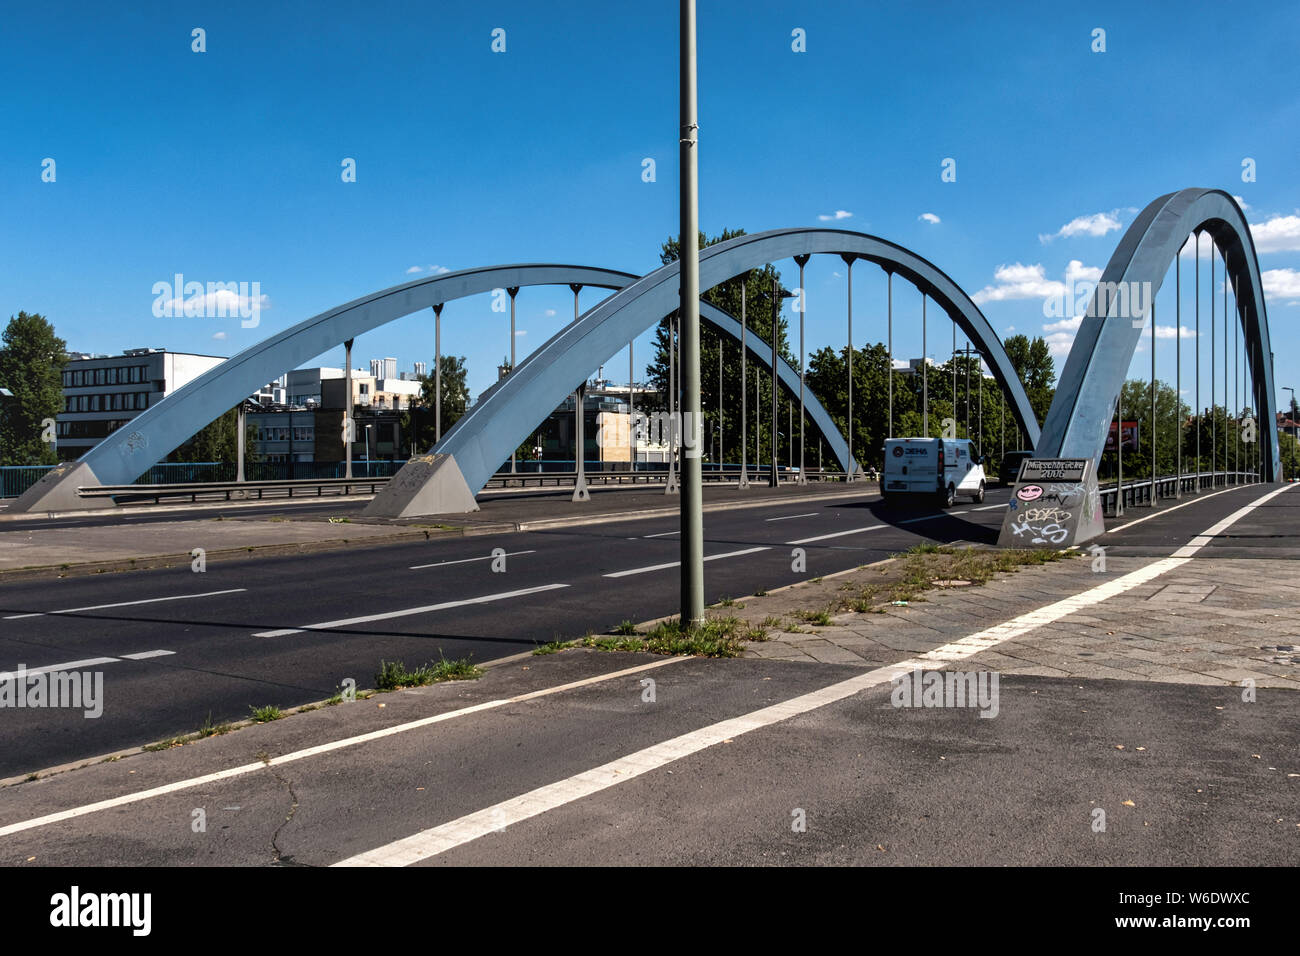 Mörsch Bridge is a road bridge, tied-arch bridge and steel bridge that was built from 2004-2006 over WesthafenKanal in Charlottenburg-Berlin. Stock Photo